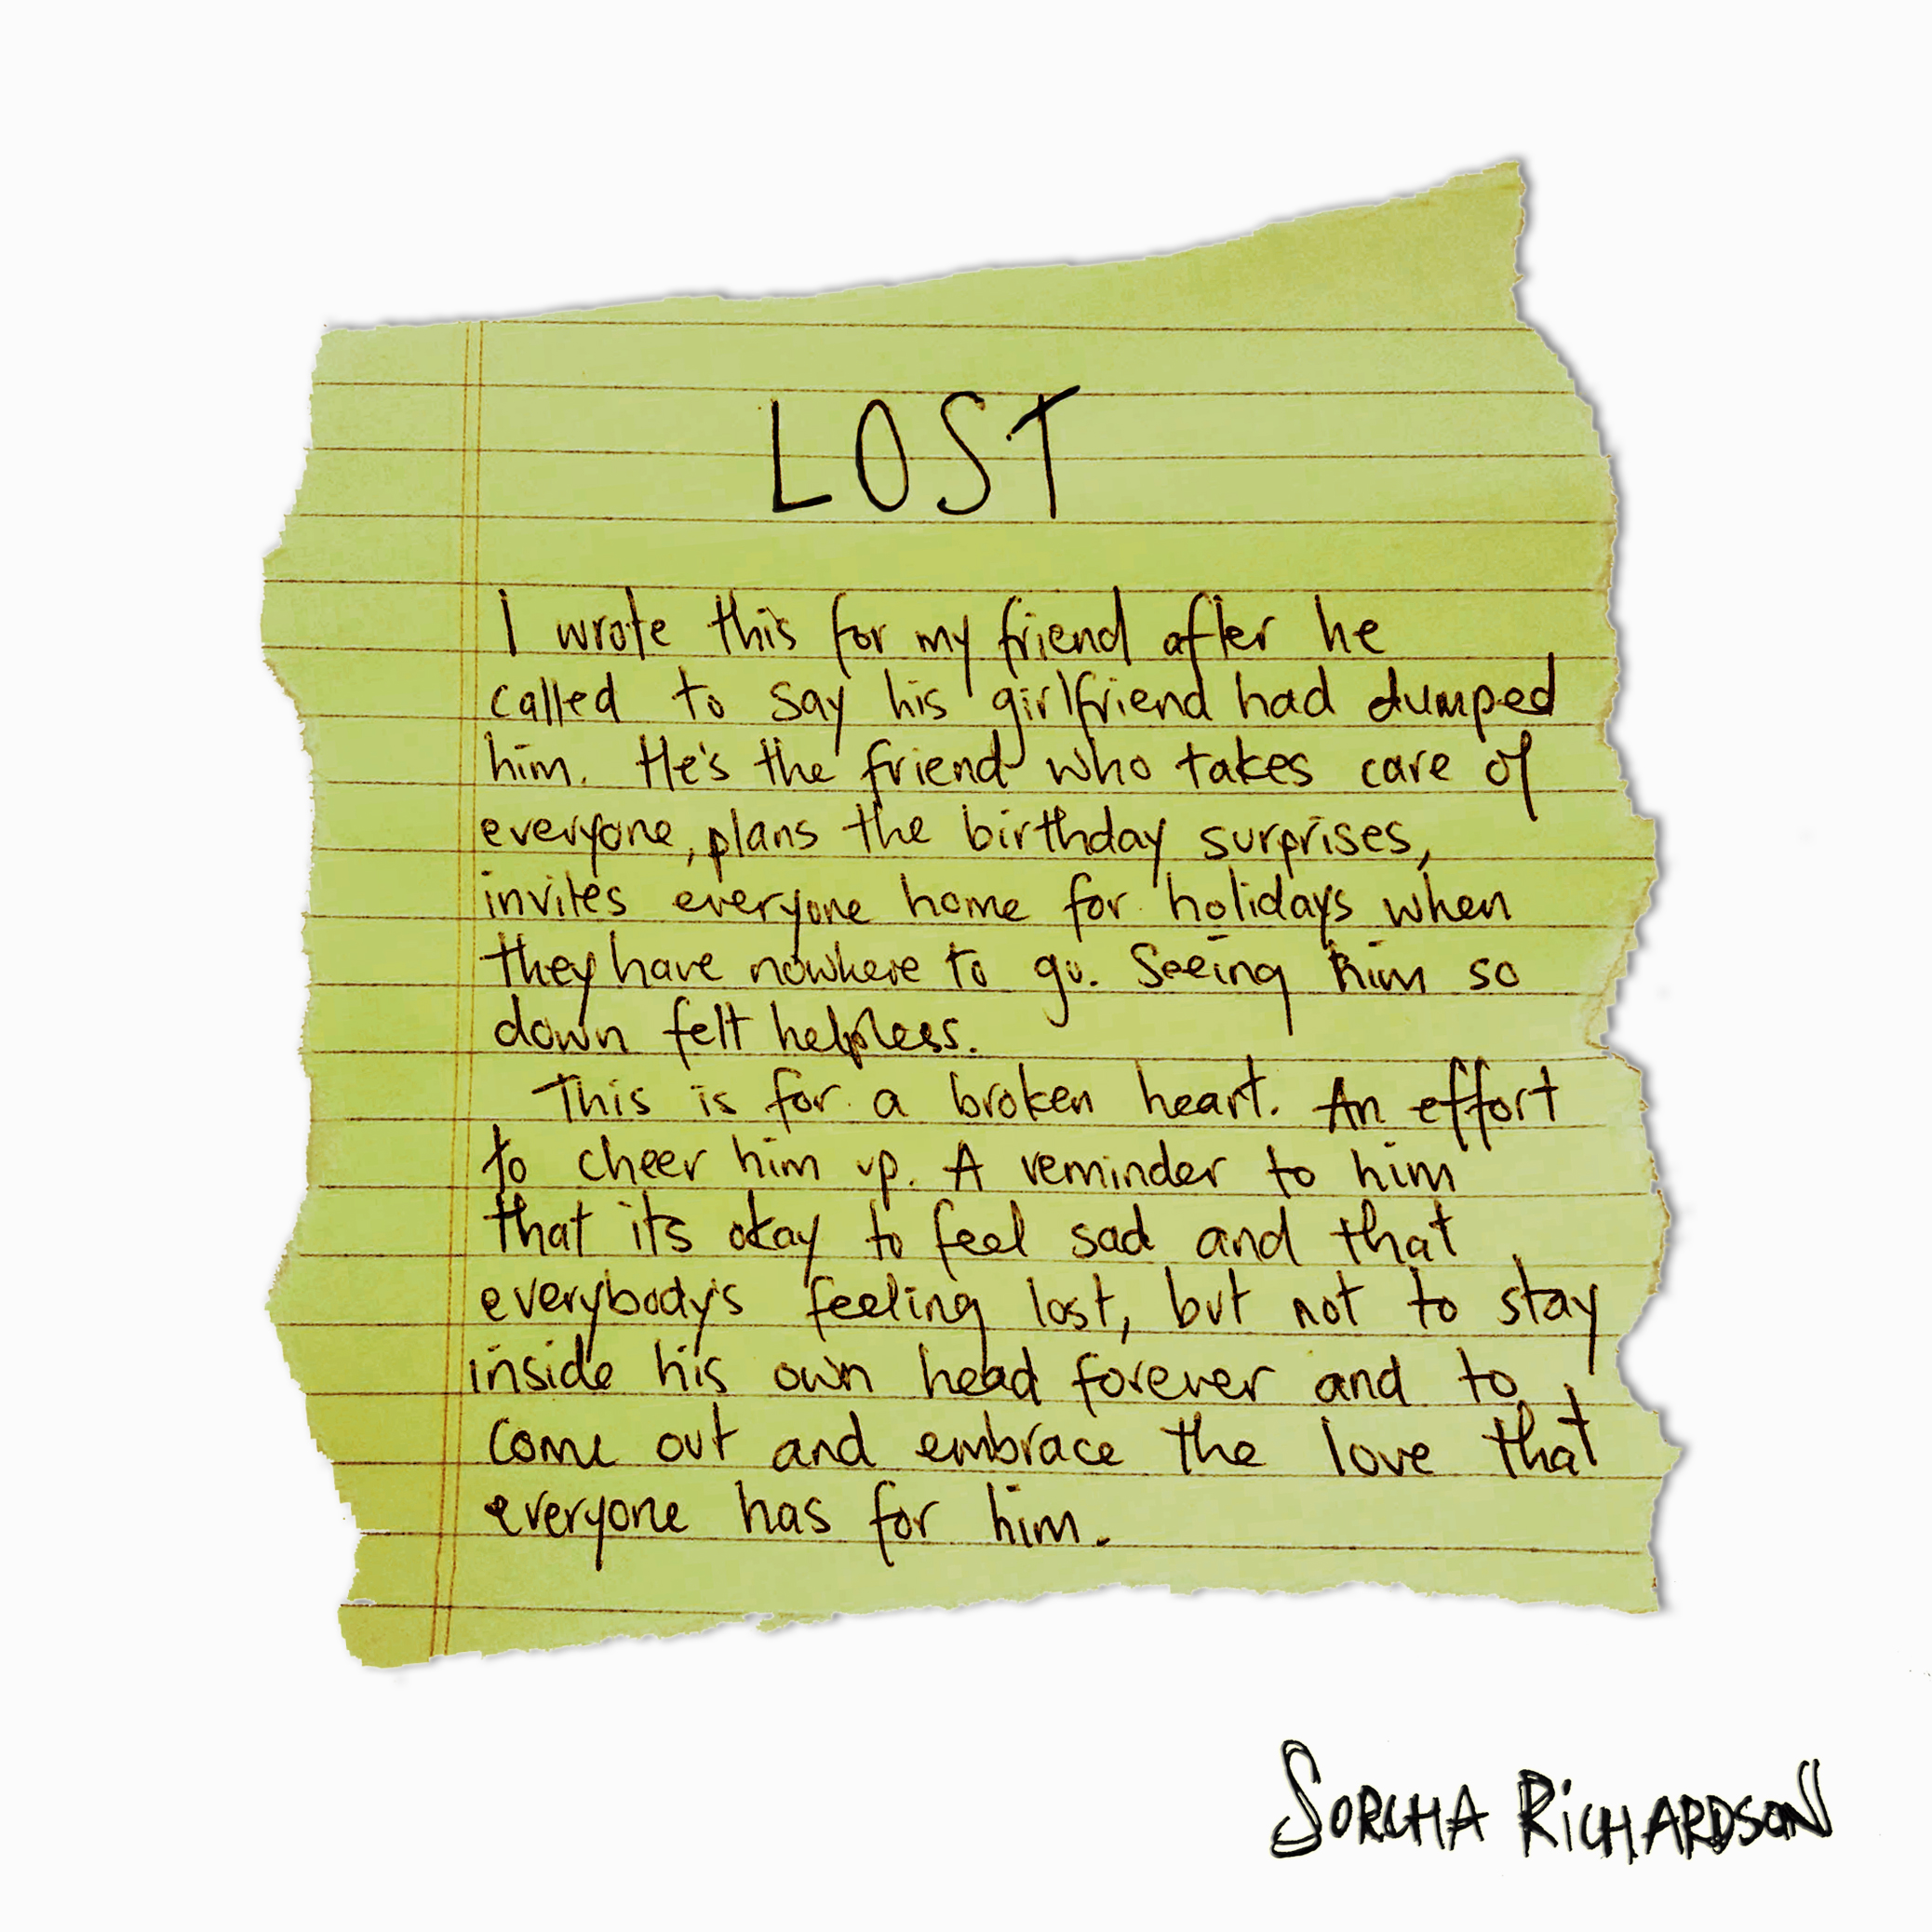 Lost - September 14, 2016